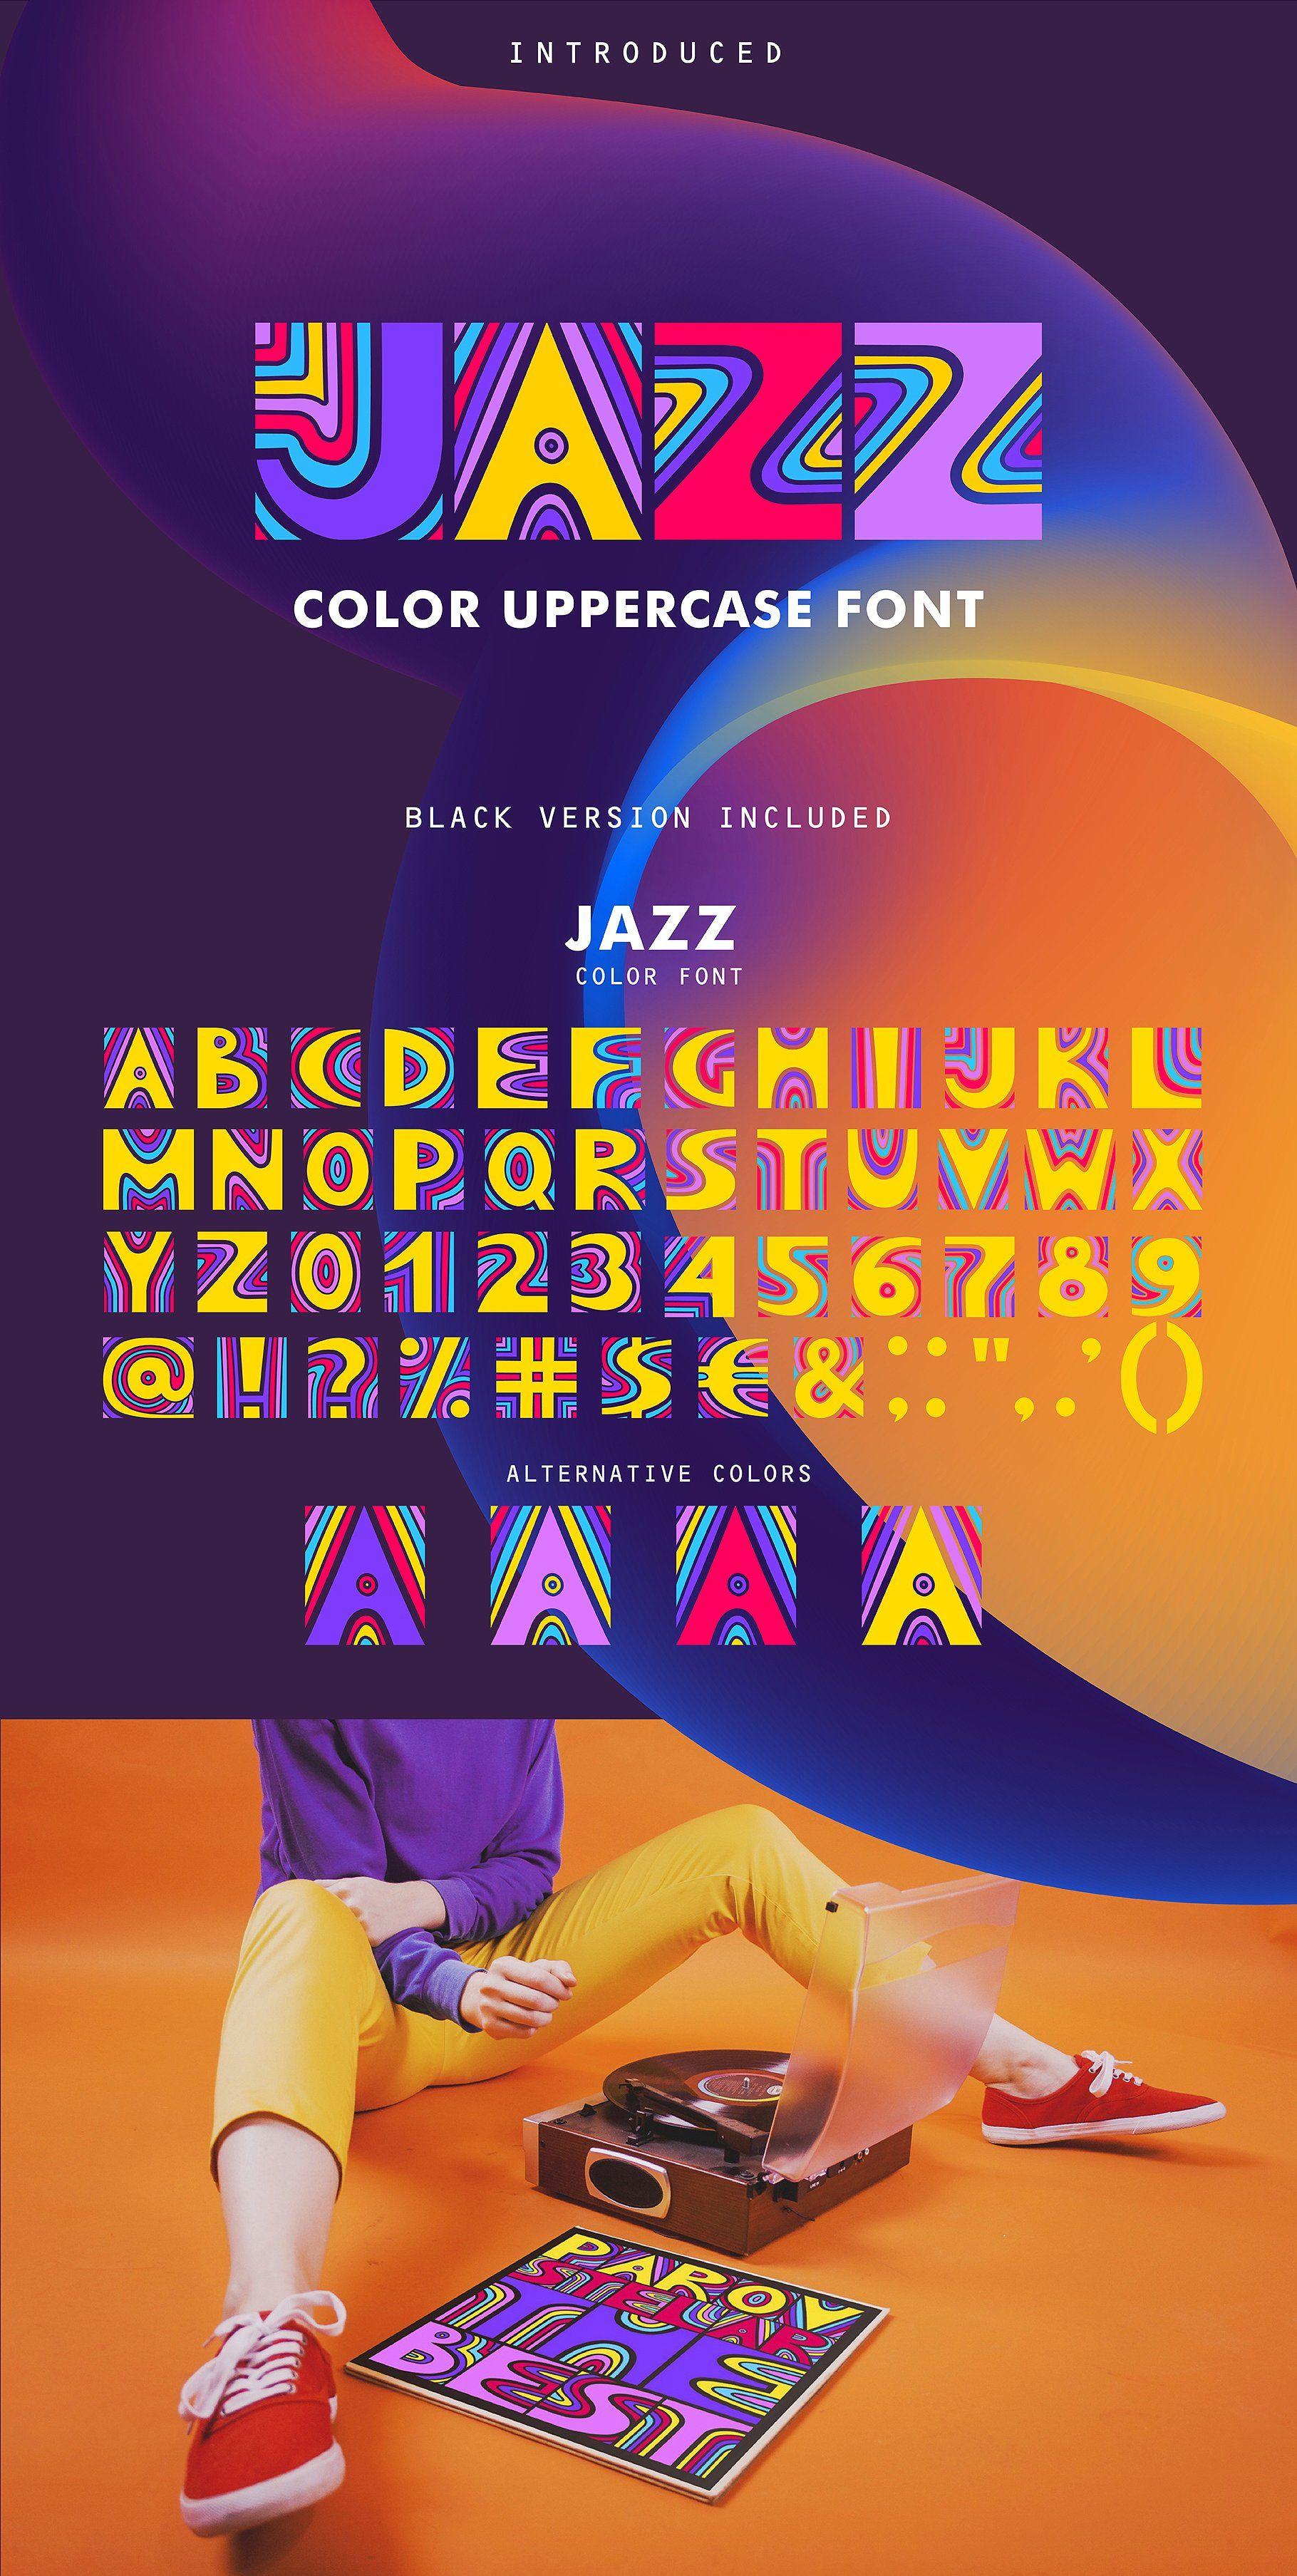 JAZZ SVG Color Font Jazz colors, Photo overlays, Music